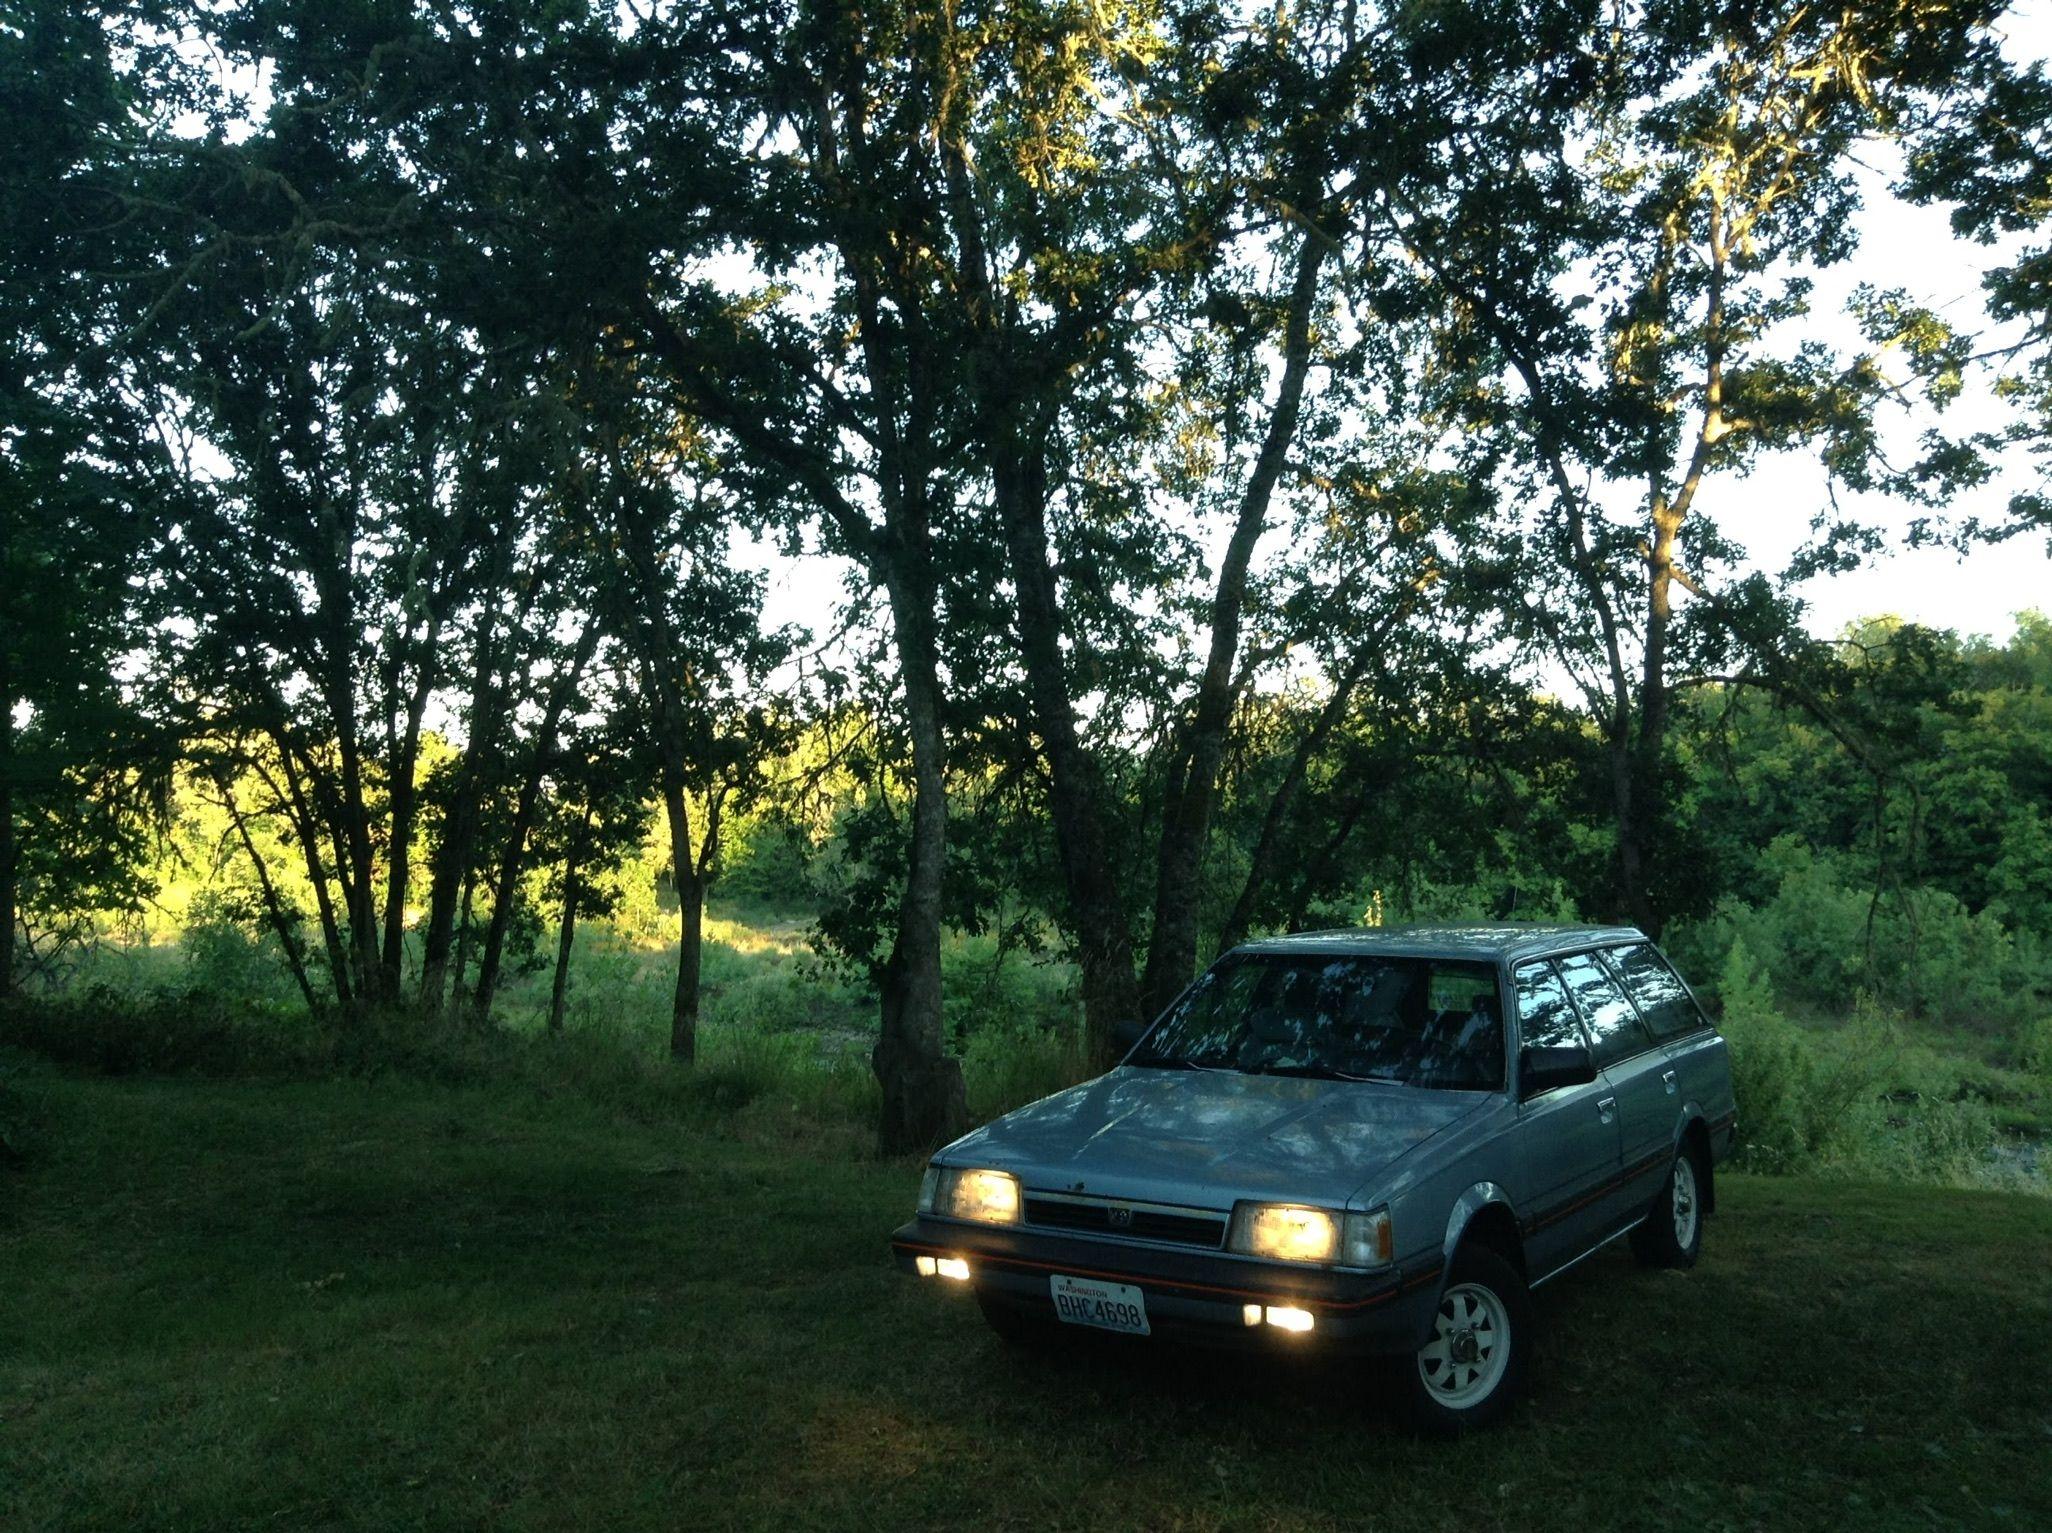 A Subie frolicking in its natural environment. Subaru